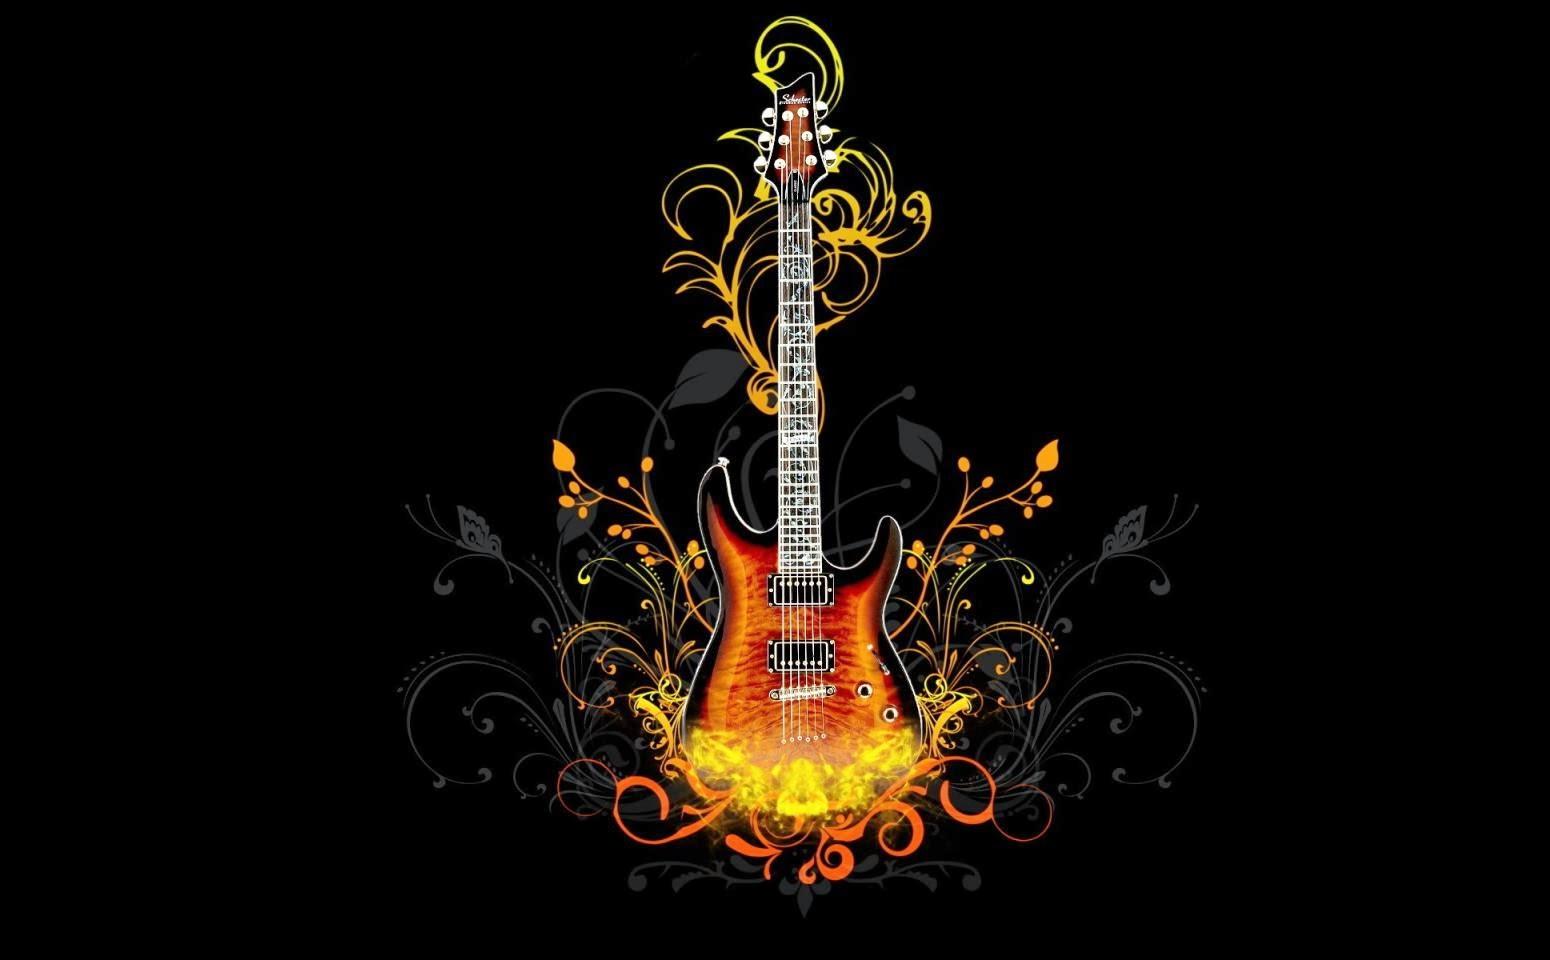 65 Gambar Gitar Keren Animasi Terbaik